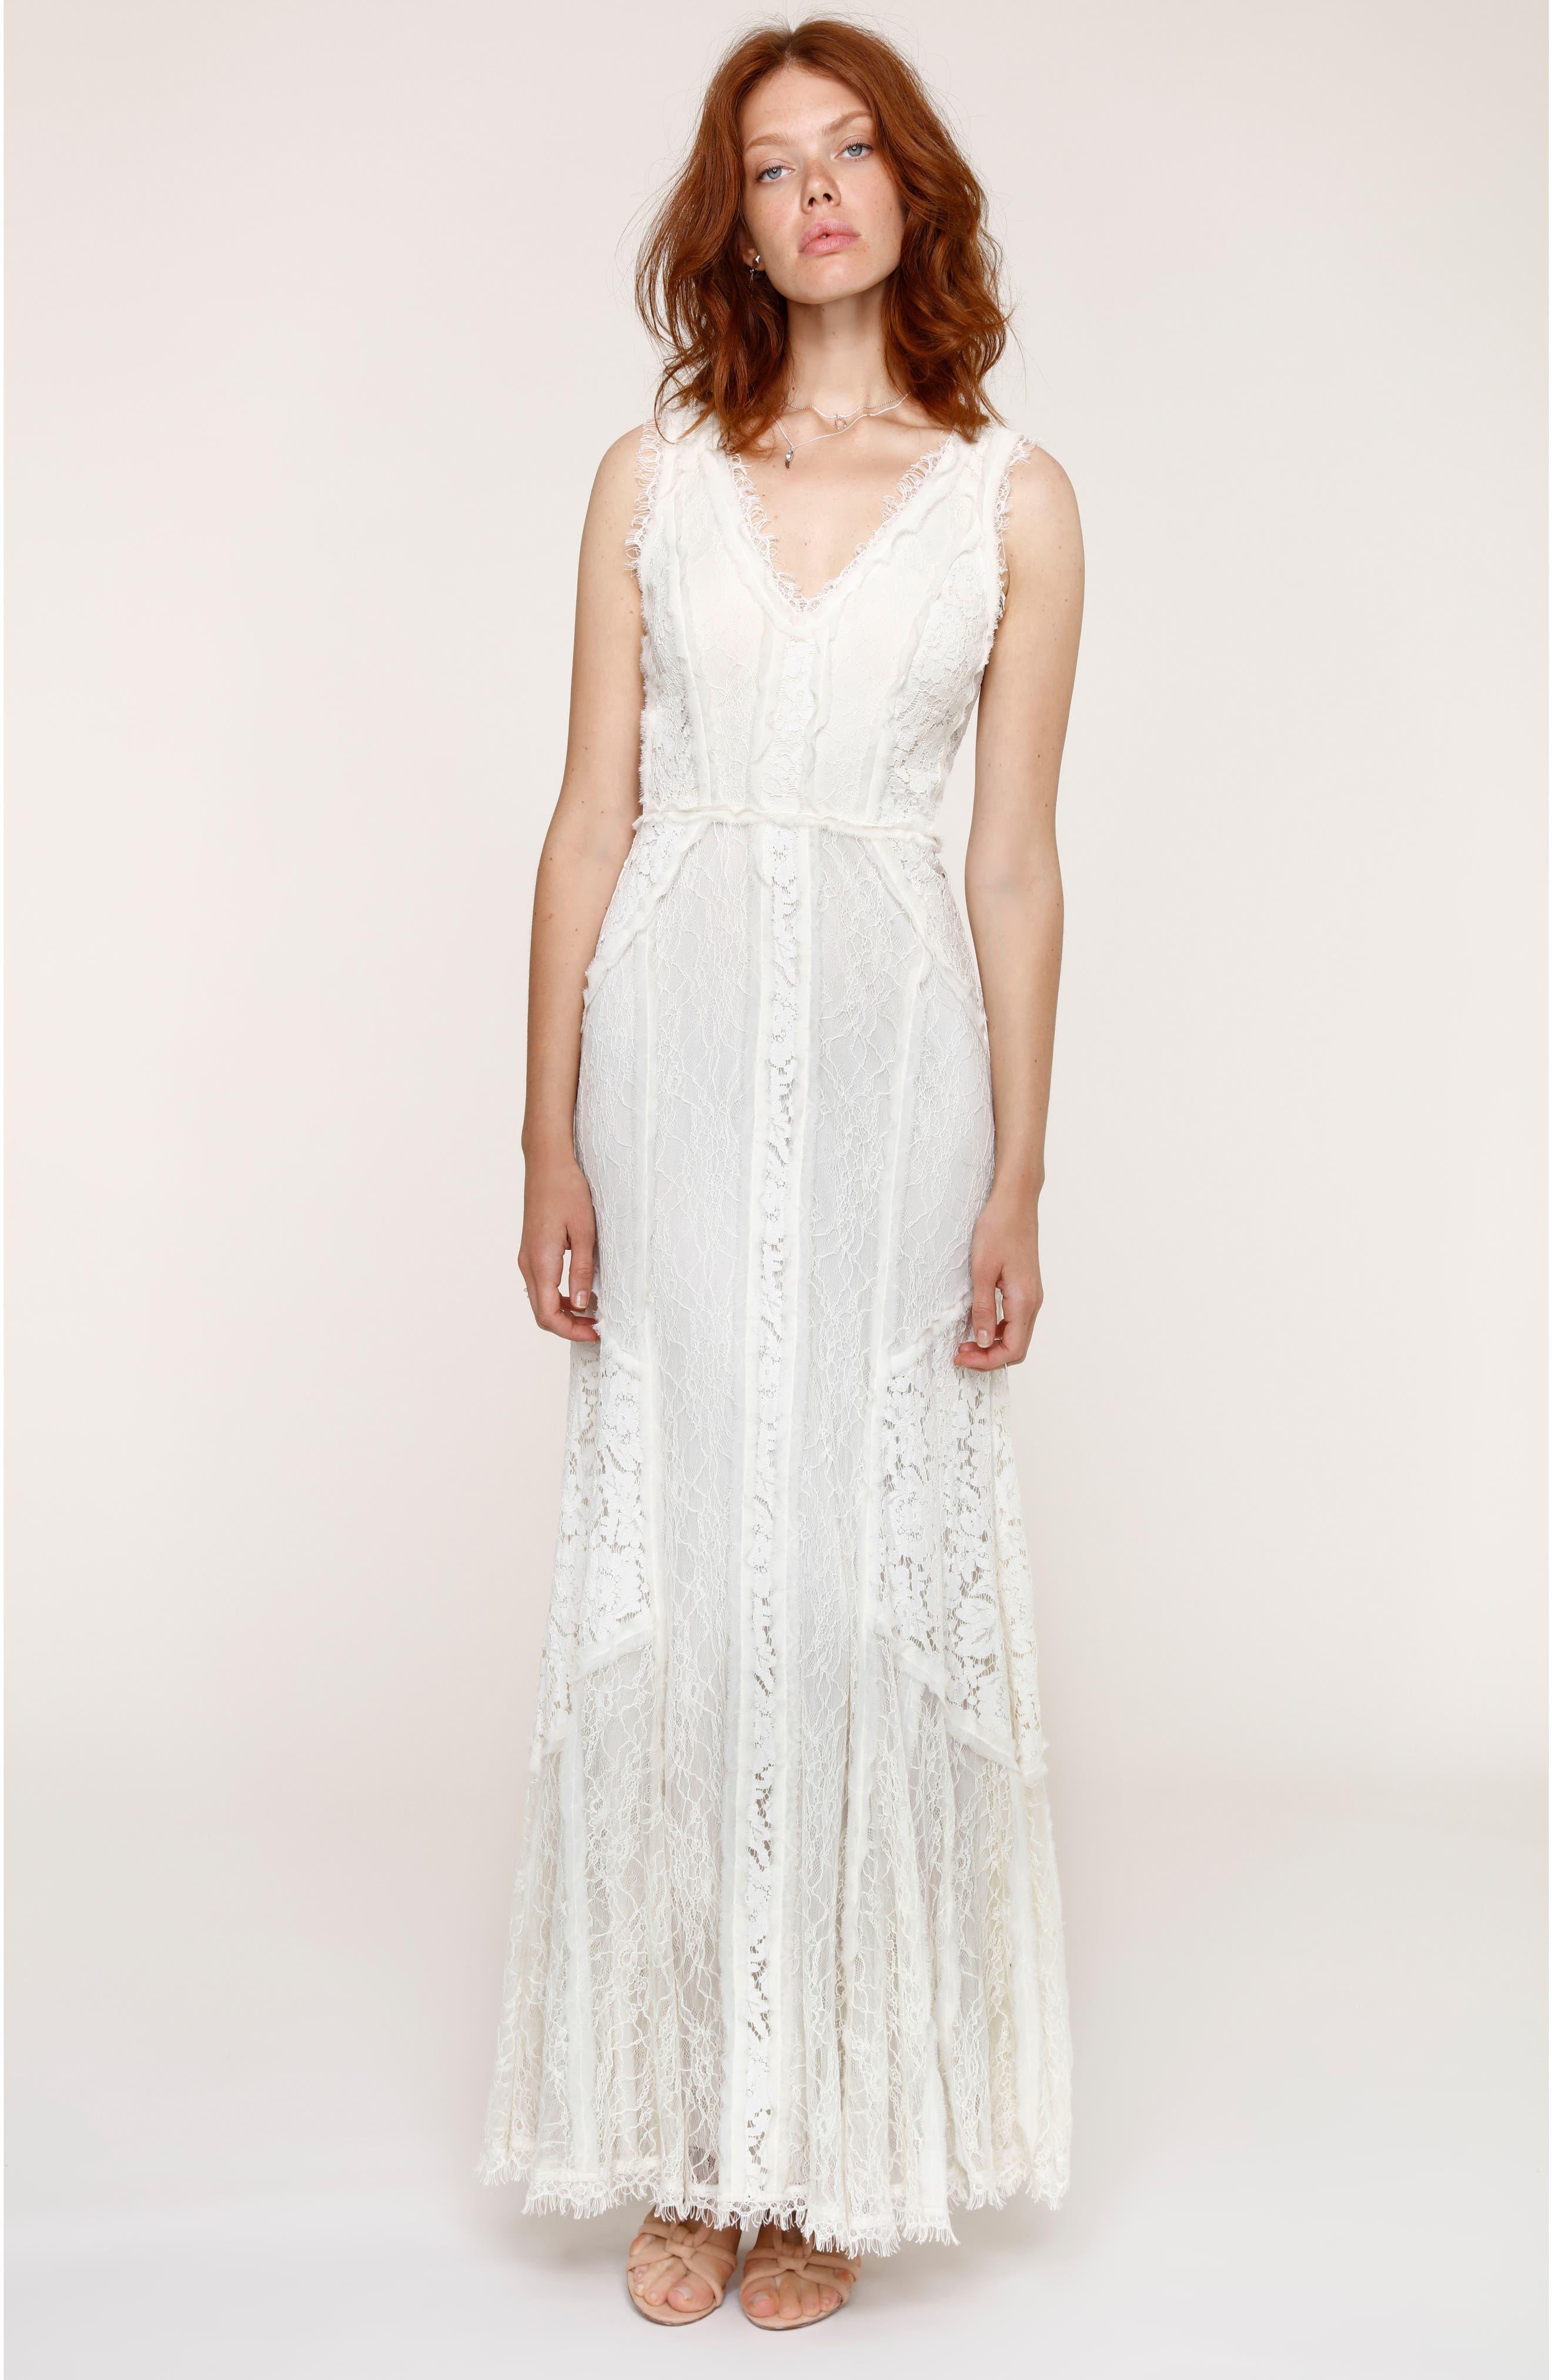 Main Image - Heartloom Felix Cutout Back Lace Fit & Flare Dress